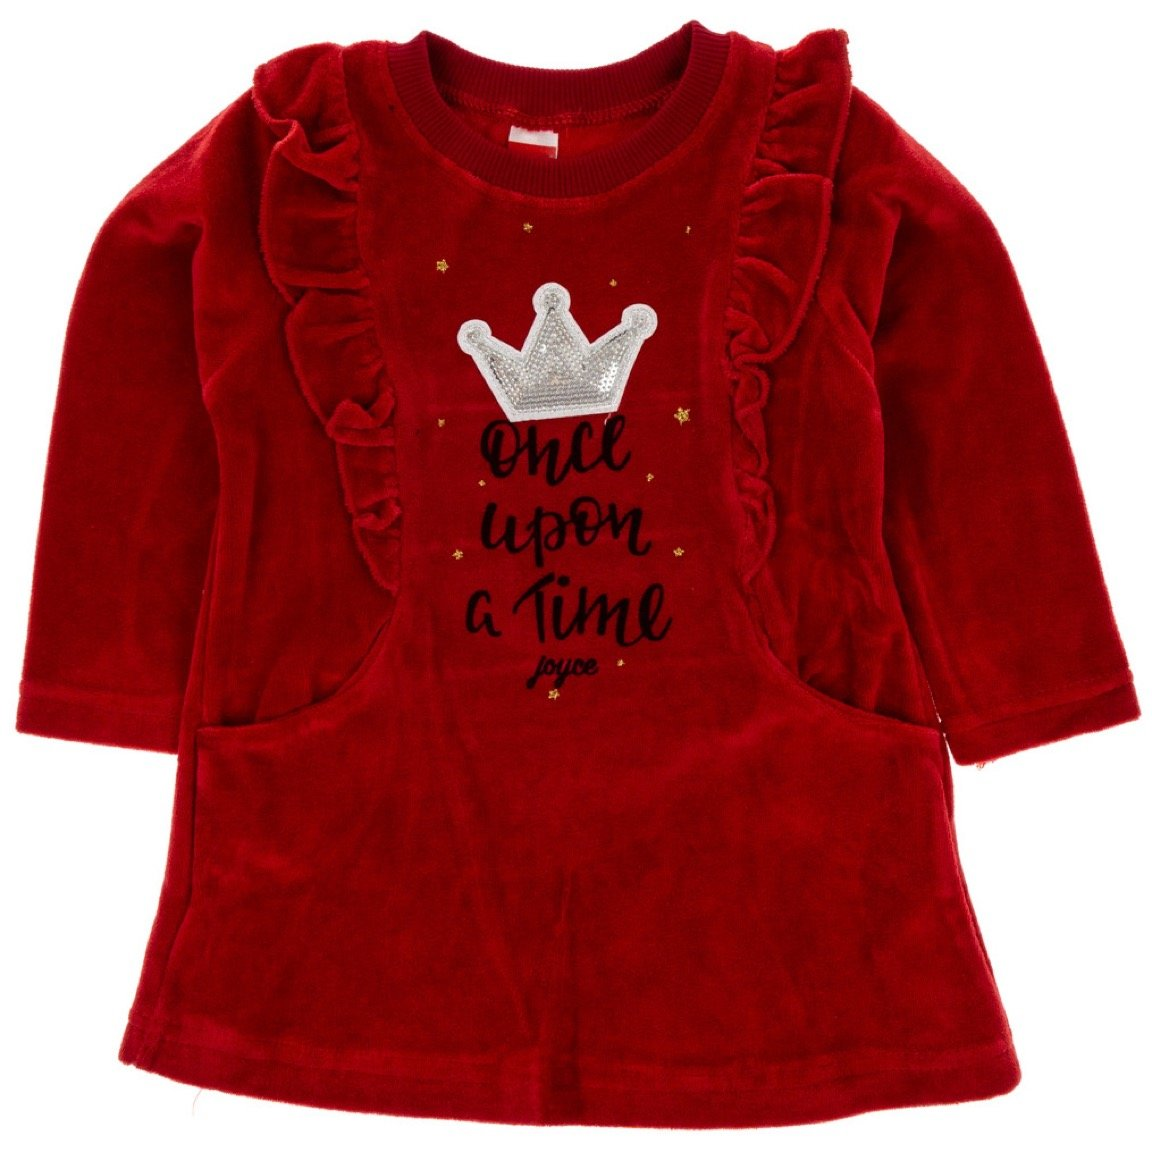 Joyce παιδικό βελουτέ φόρεμα «Once Upon a Time»